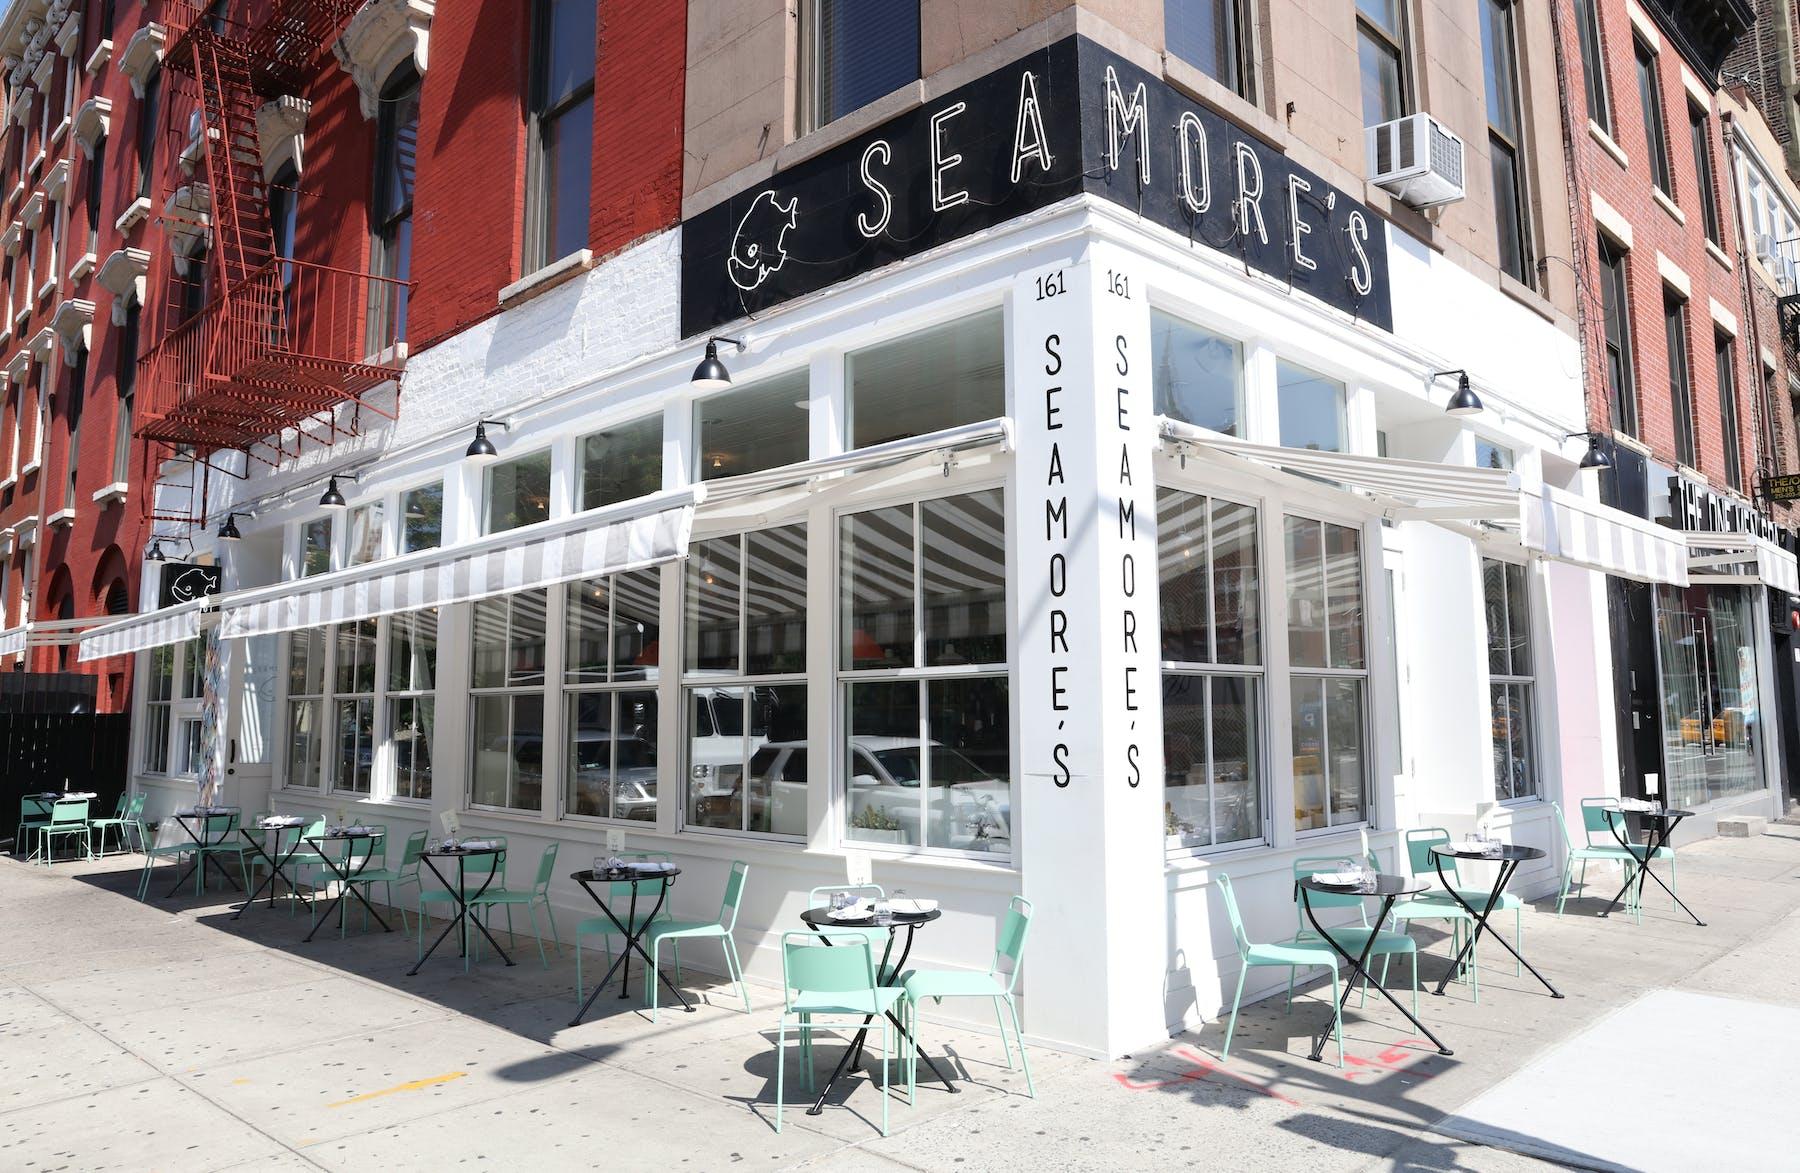 image of a restaurant exterior